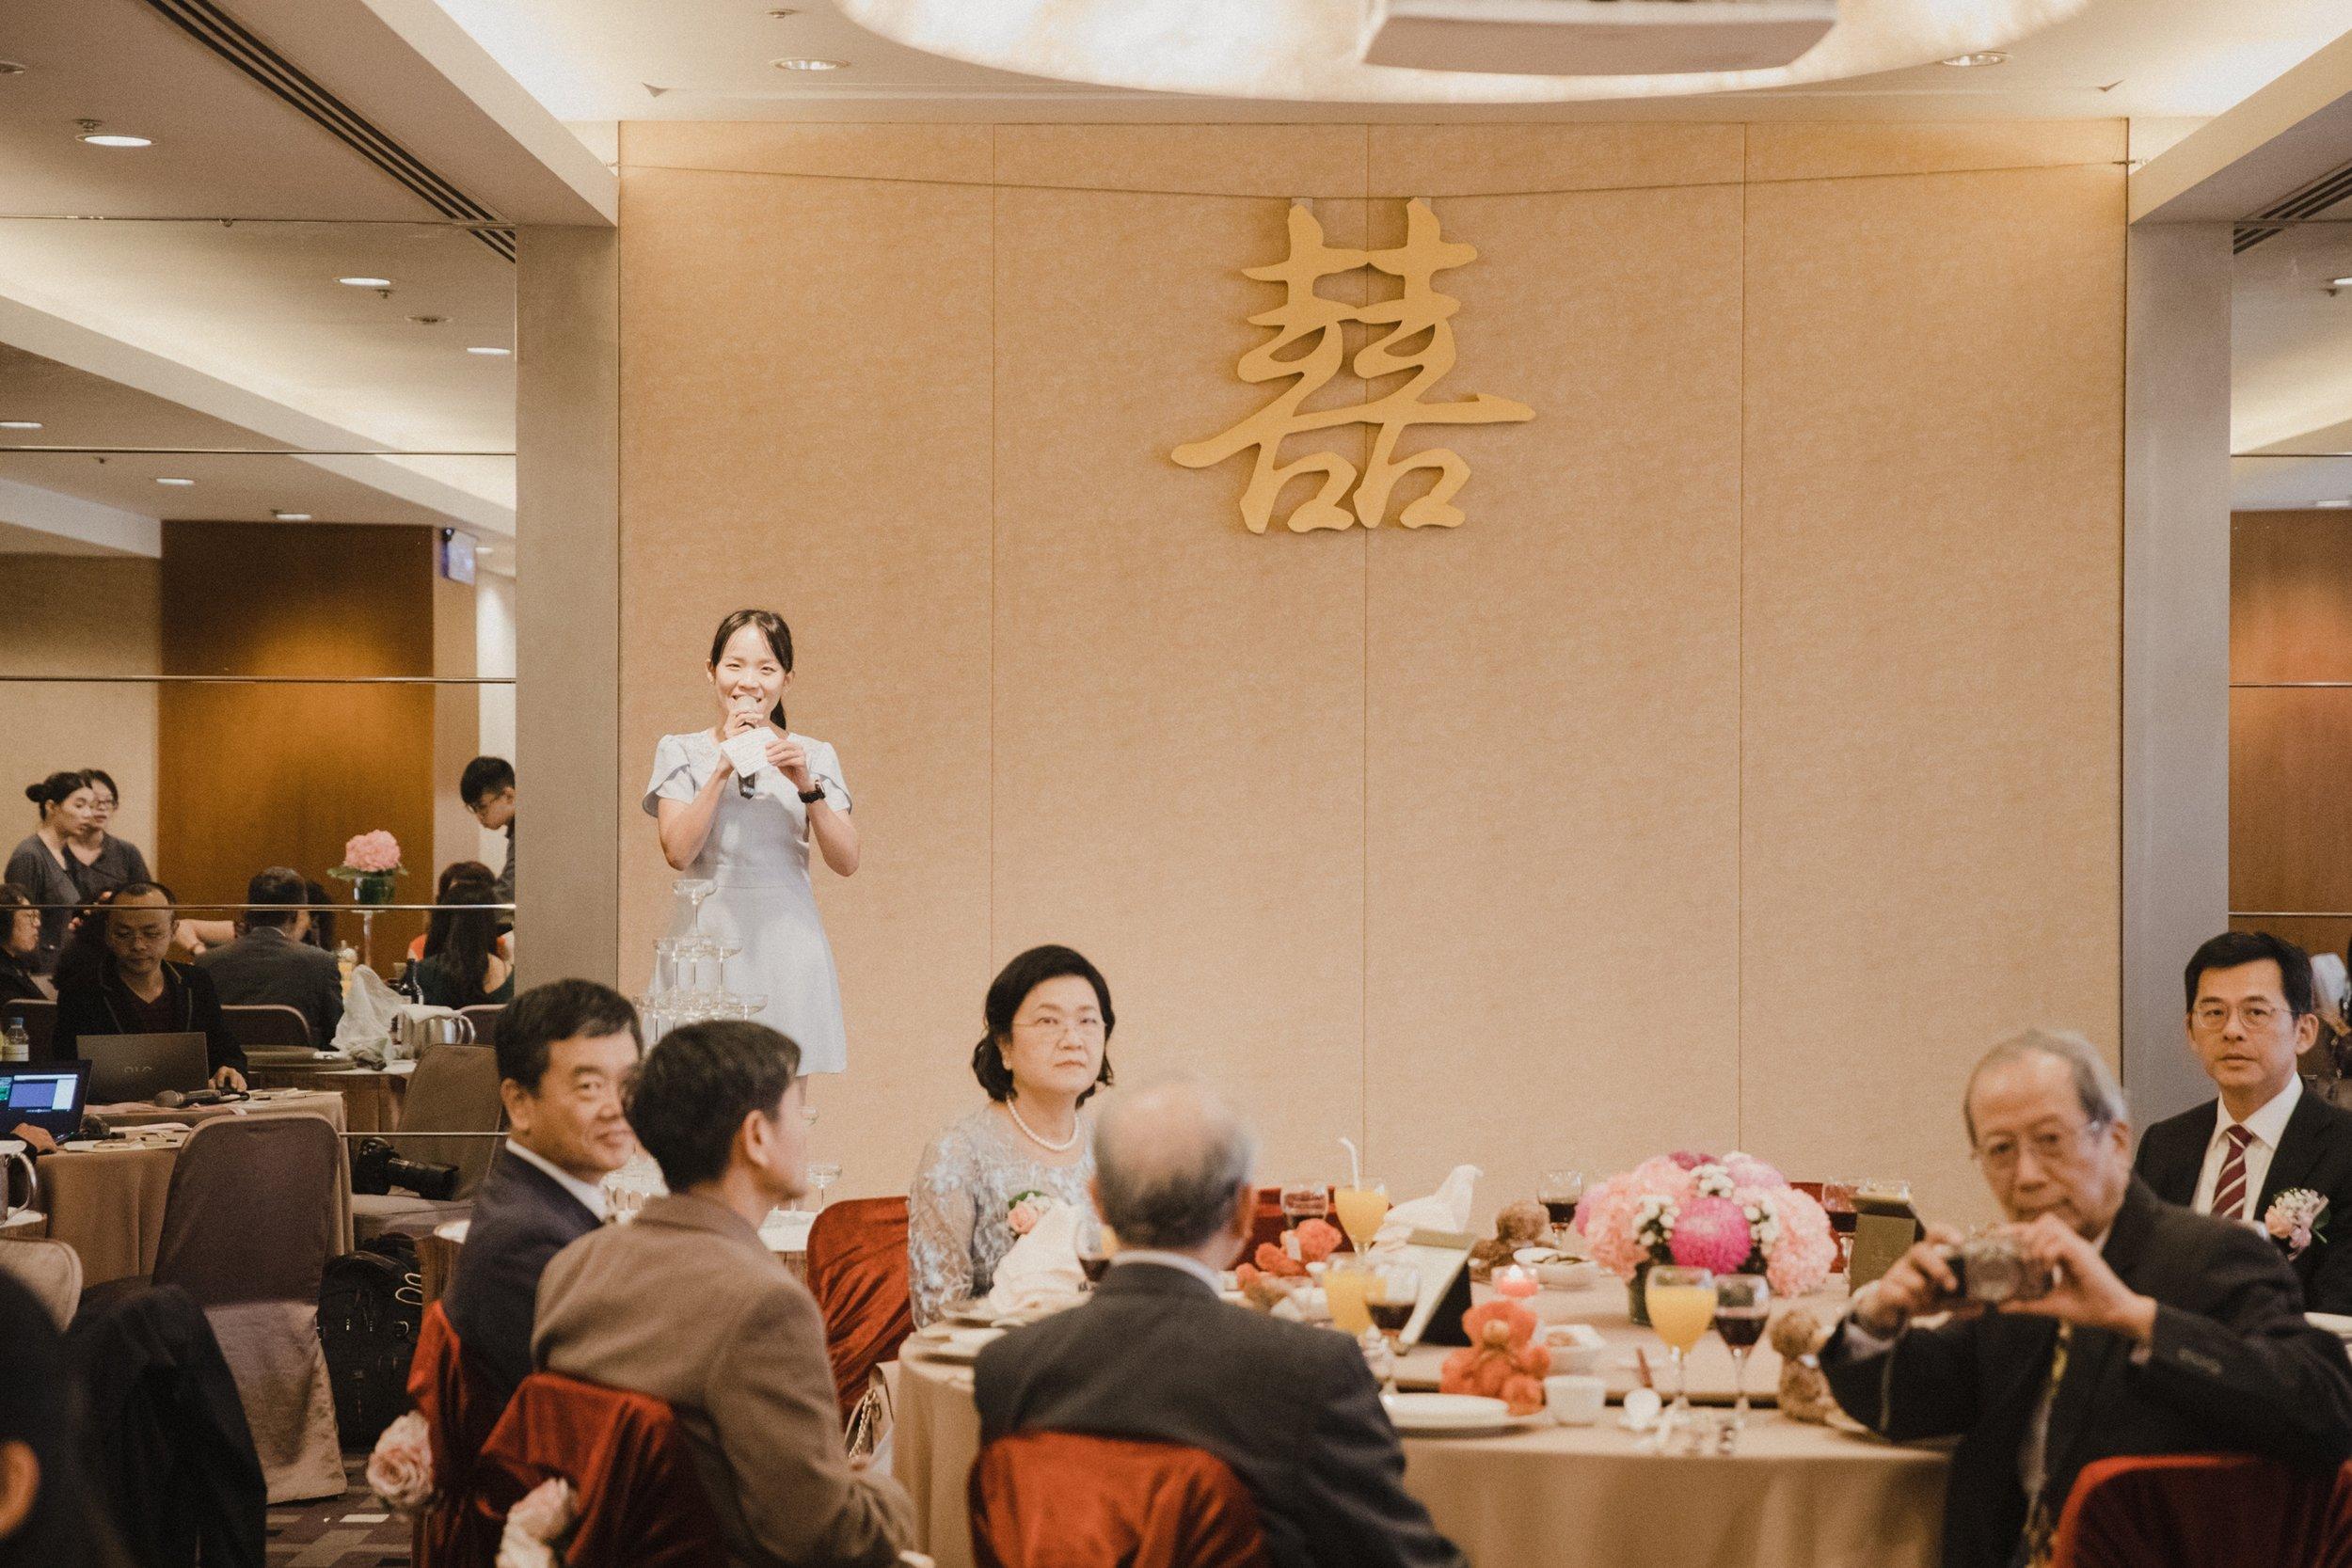 wedding-caridee-oscar-lunch-ambassador-hsinchu-結婚午宴-新竹國賓_56.jpg